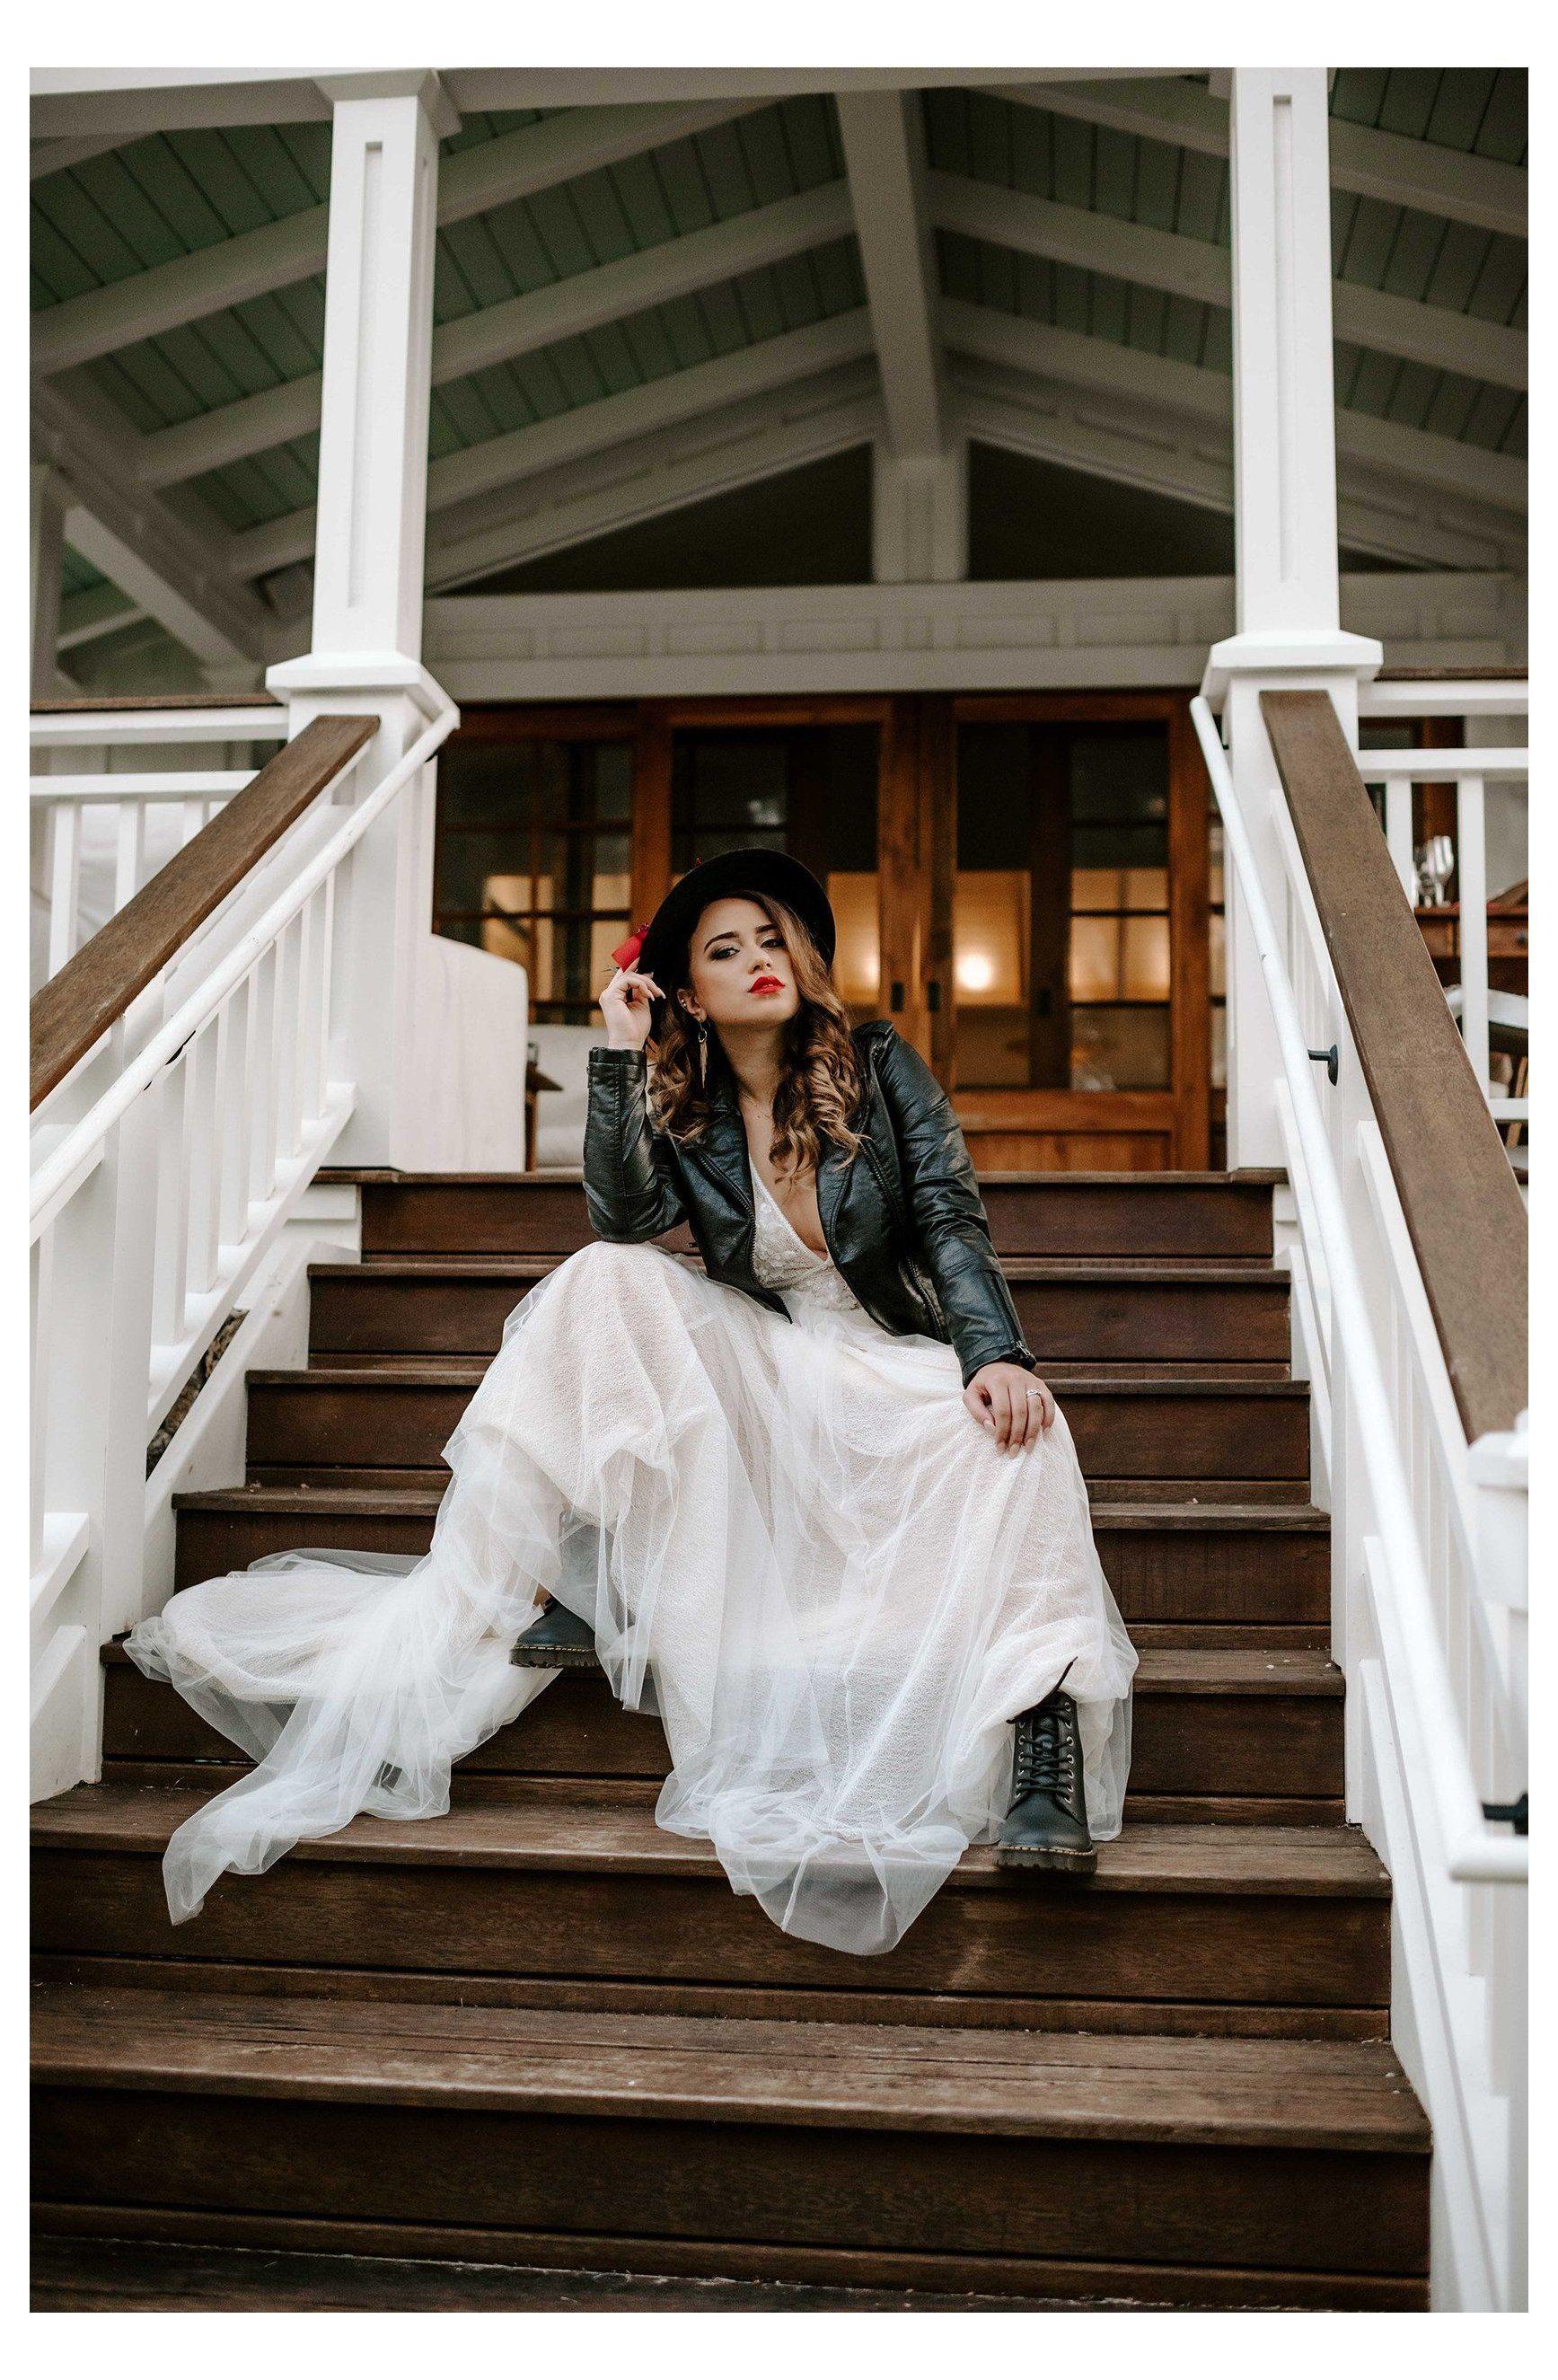 Bridal Kmang Photography Leather Jacket Wedding Dress Leatherjacketweddin In 2021 Leather Jacket Wedding Leather Jacket Wedding Dress White Leather Wedding Dress [ 2650 x 1735 Pixel ]